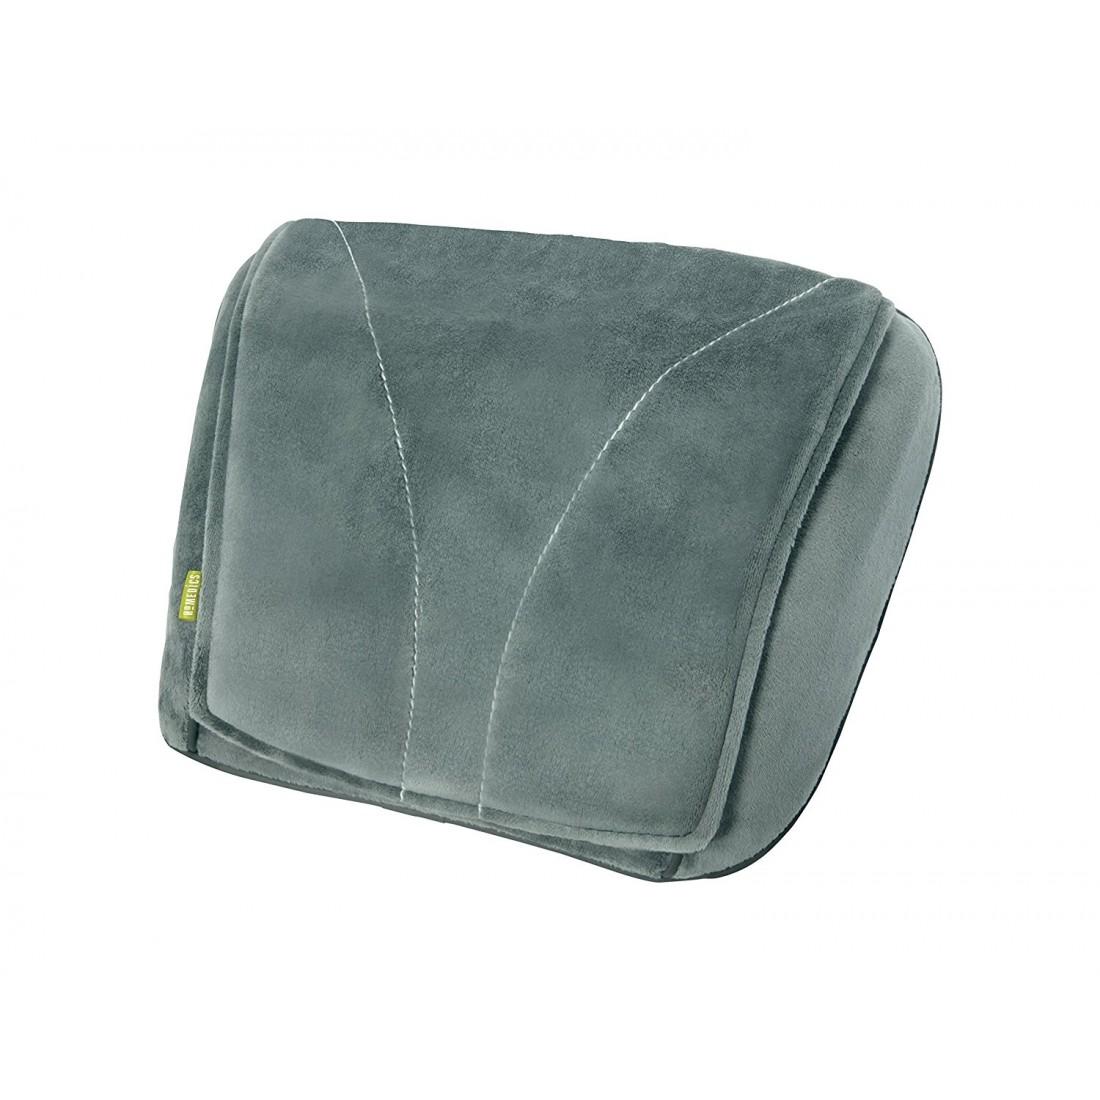 homedics shiatsu massage pillow back neck shoulders legs. Black Bedroom Furniture Sets. Home Design Ideas